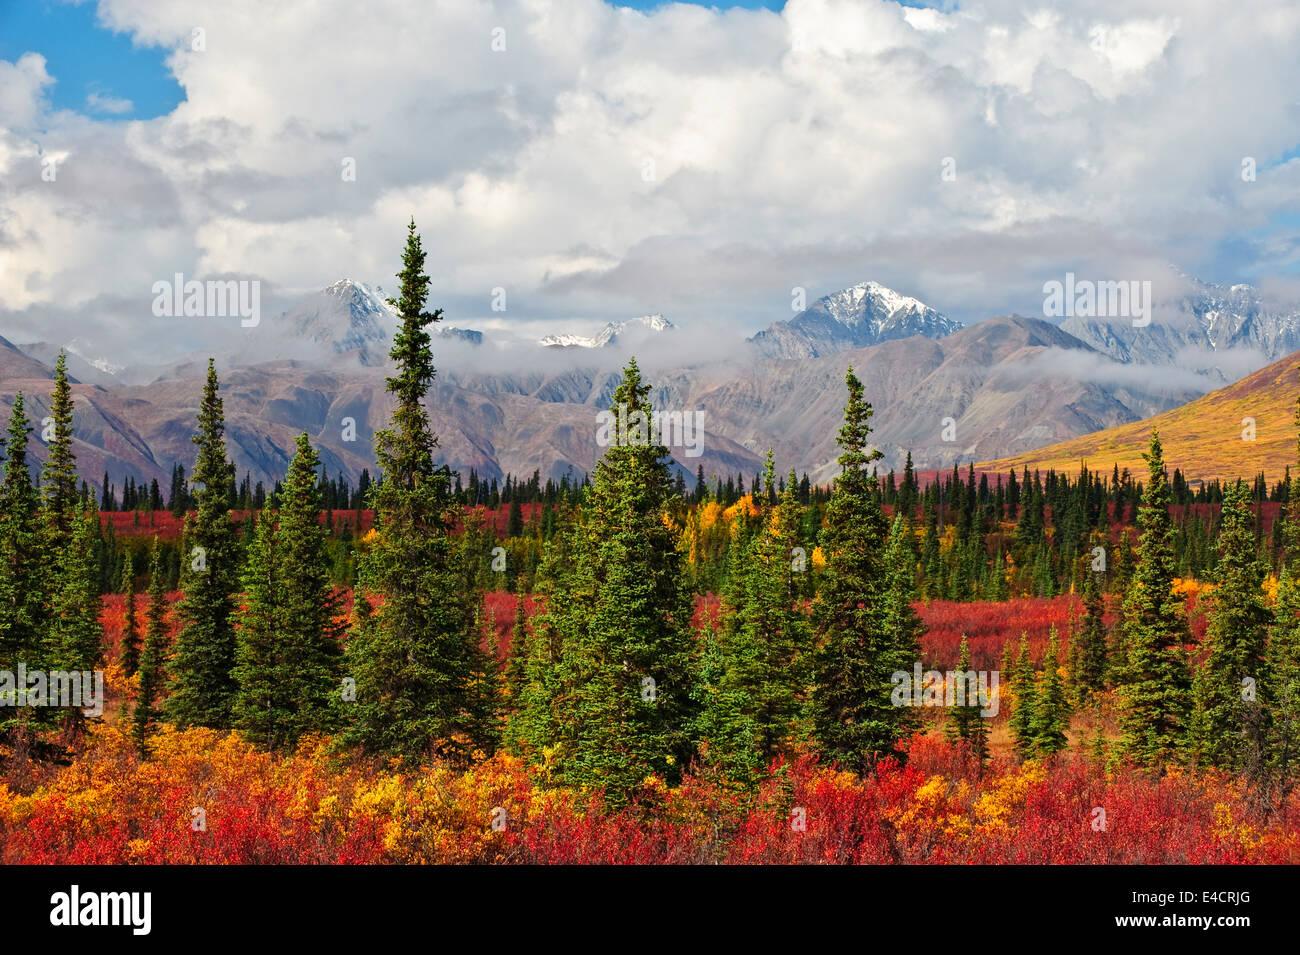 Fall color and the Alaskan range outside of Denali National Park, Alaska. - Stock Image